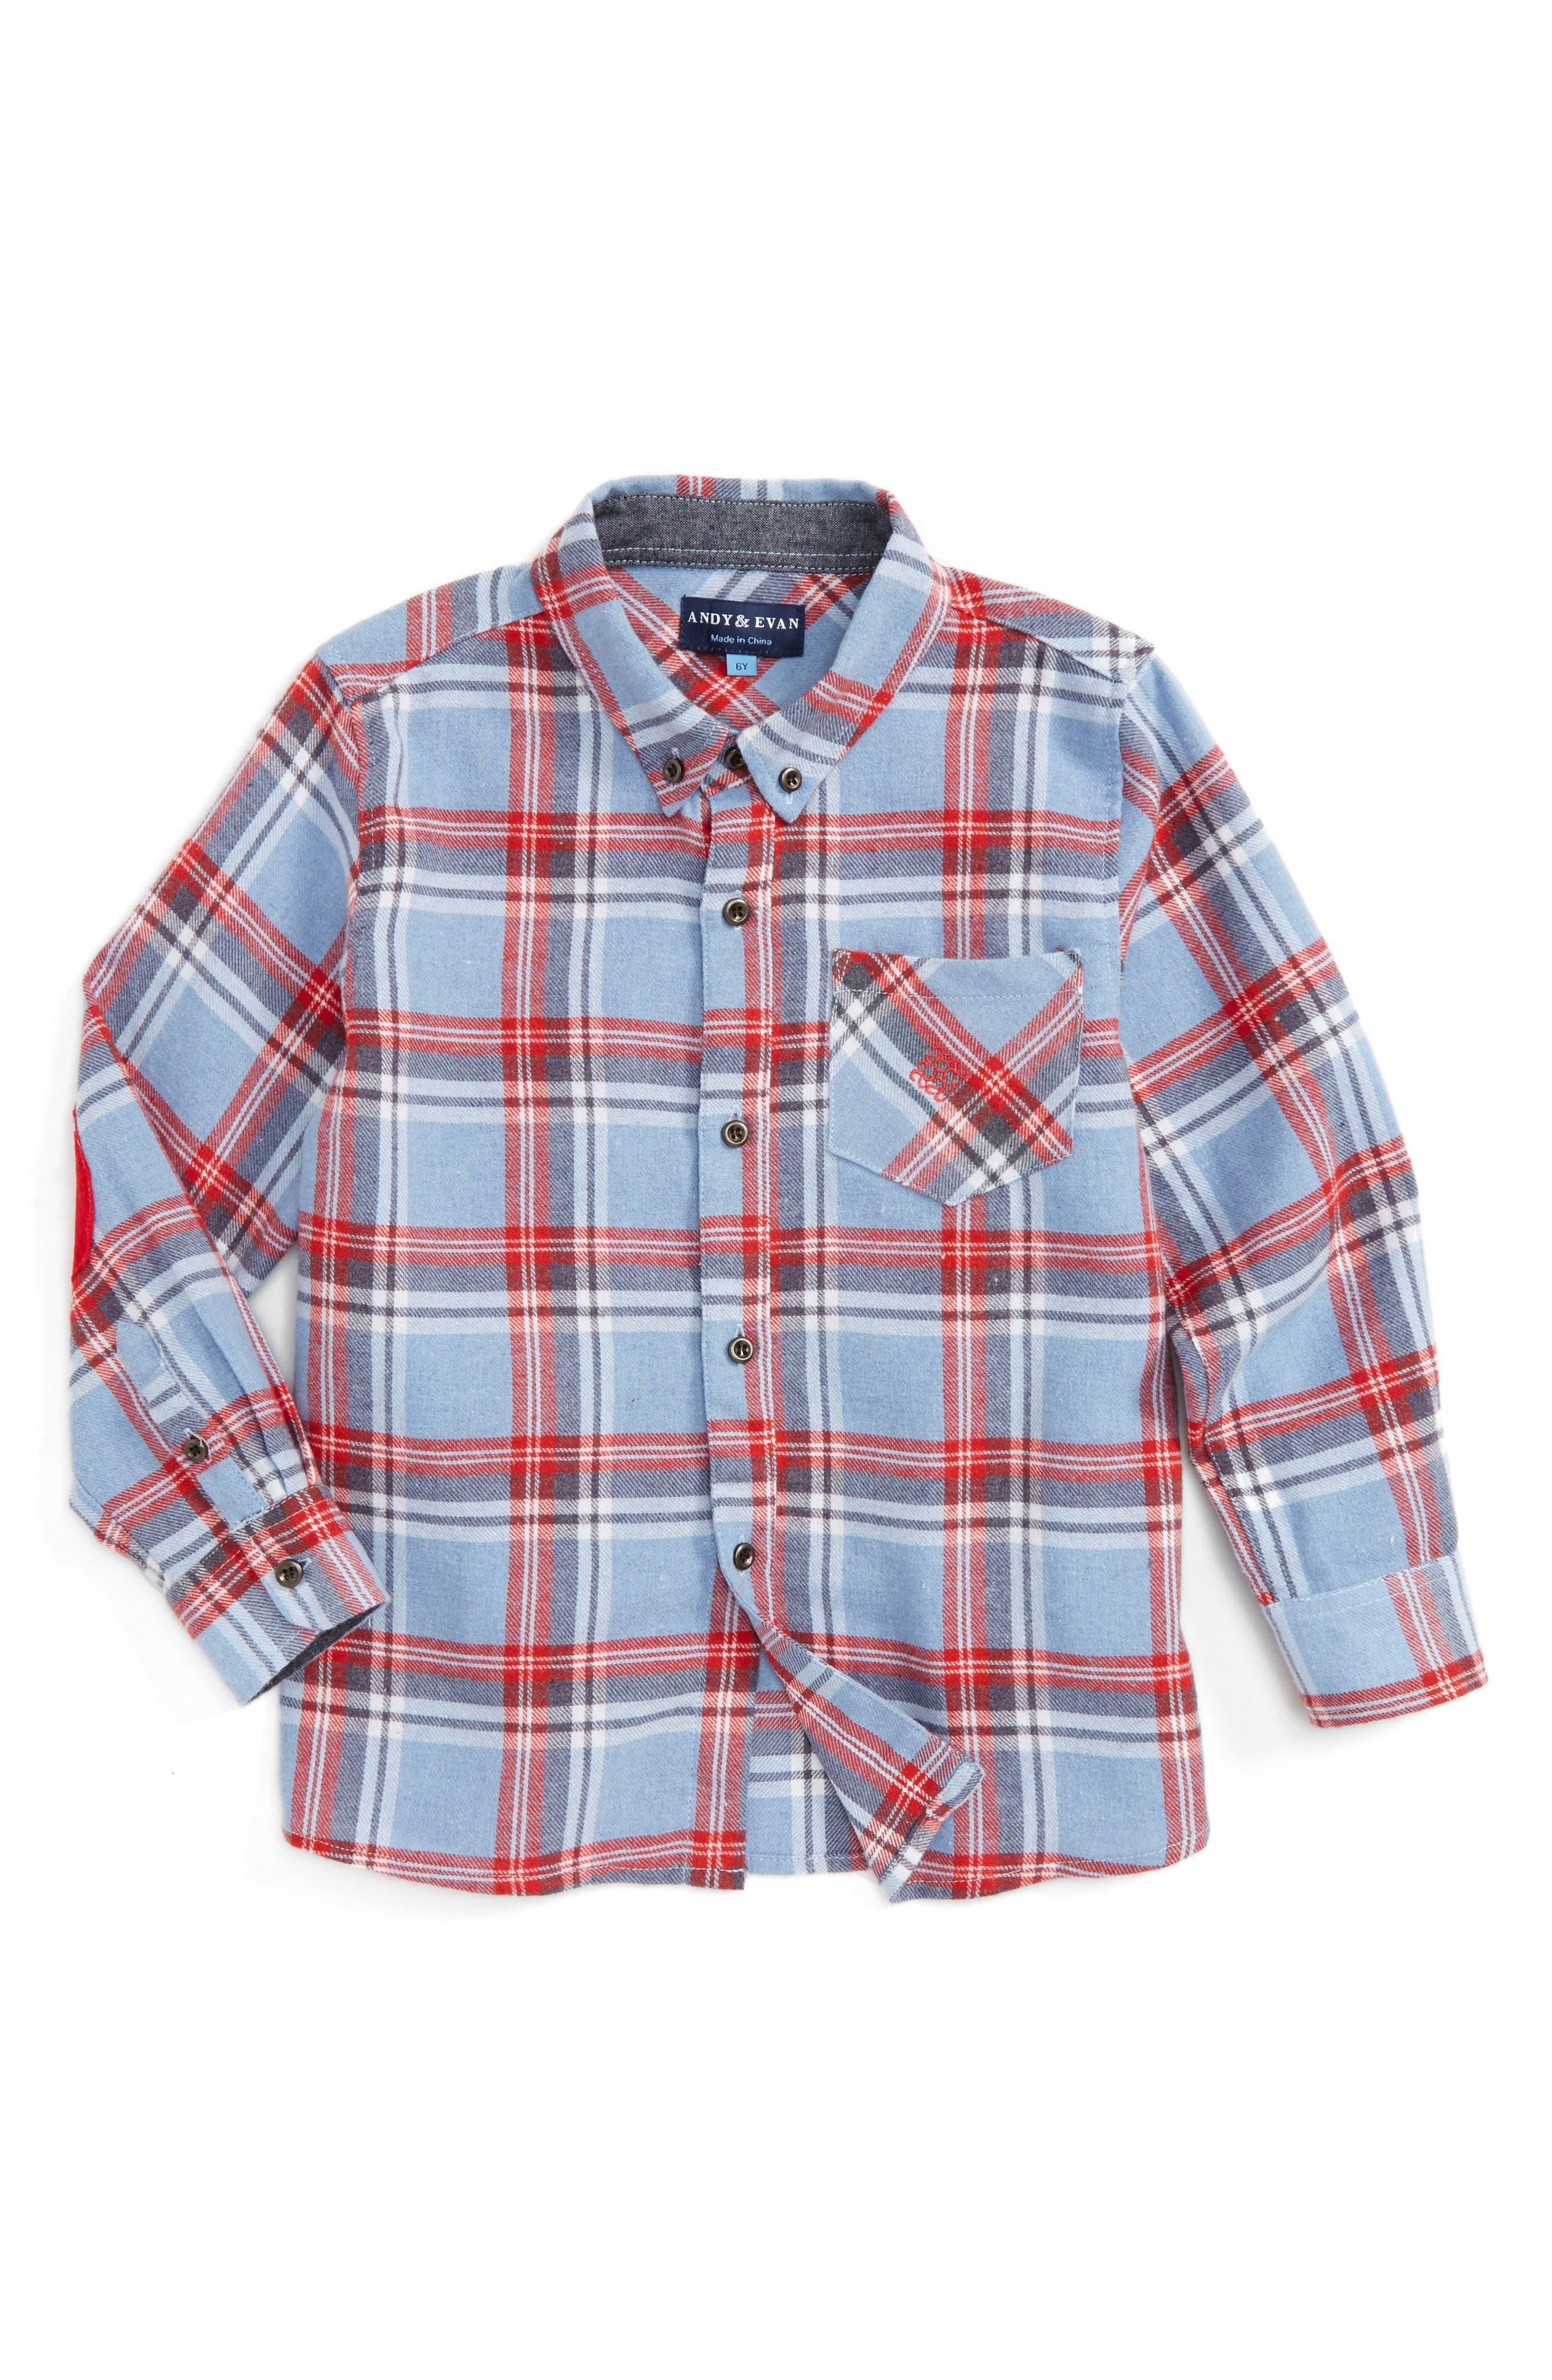 Main Image - Andy & Evan Plaid Flannel Shirt (Toddler Boys & Little Boys)